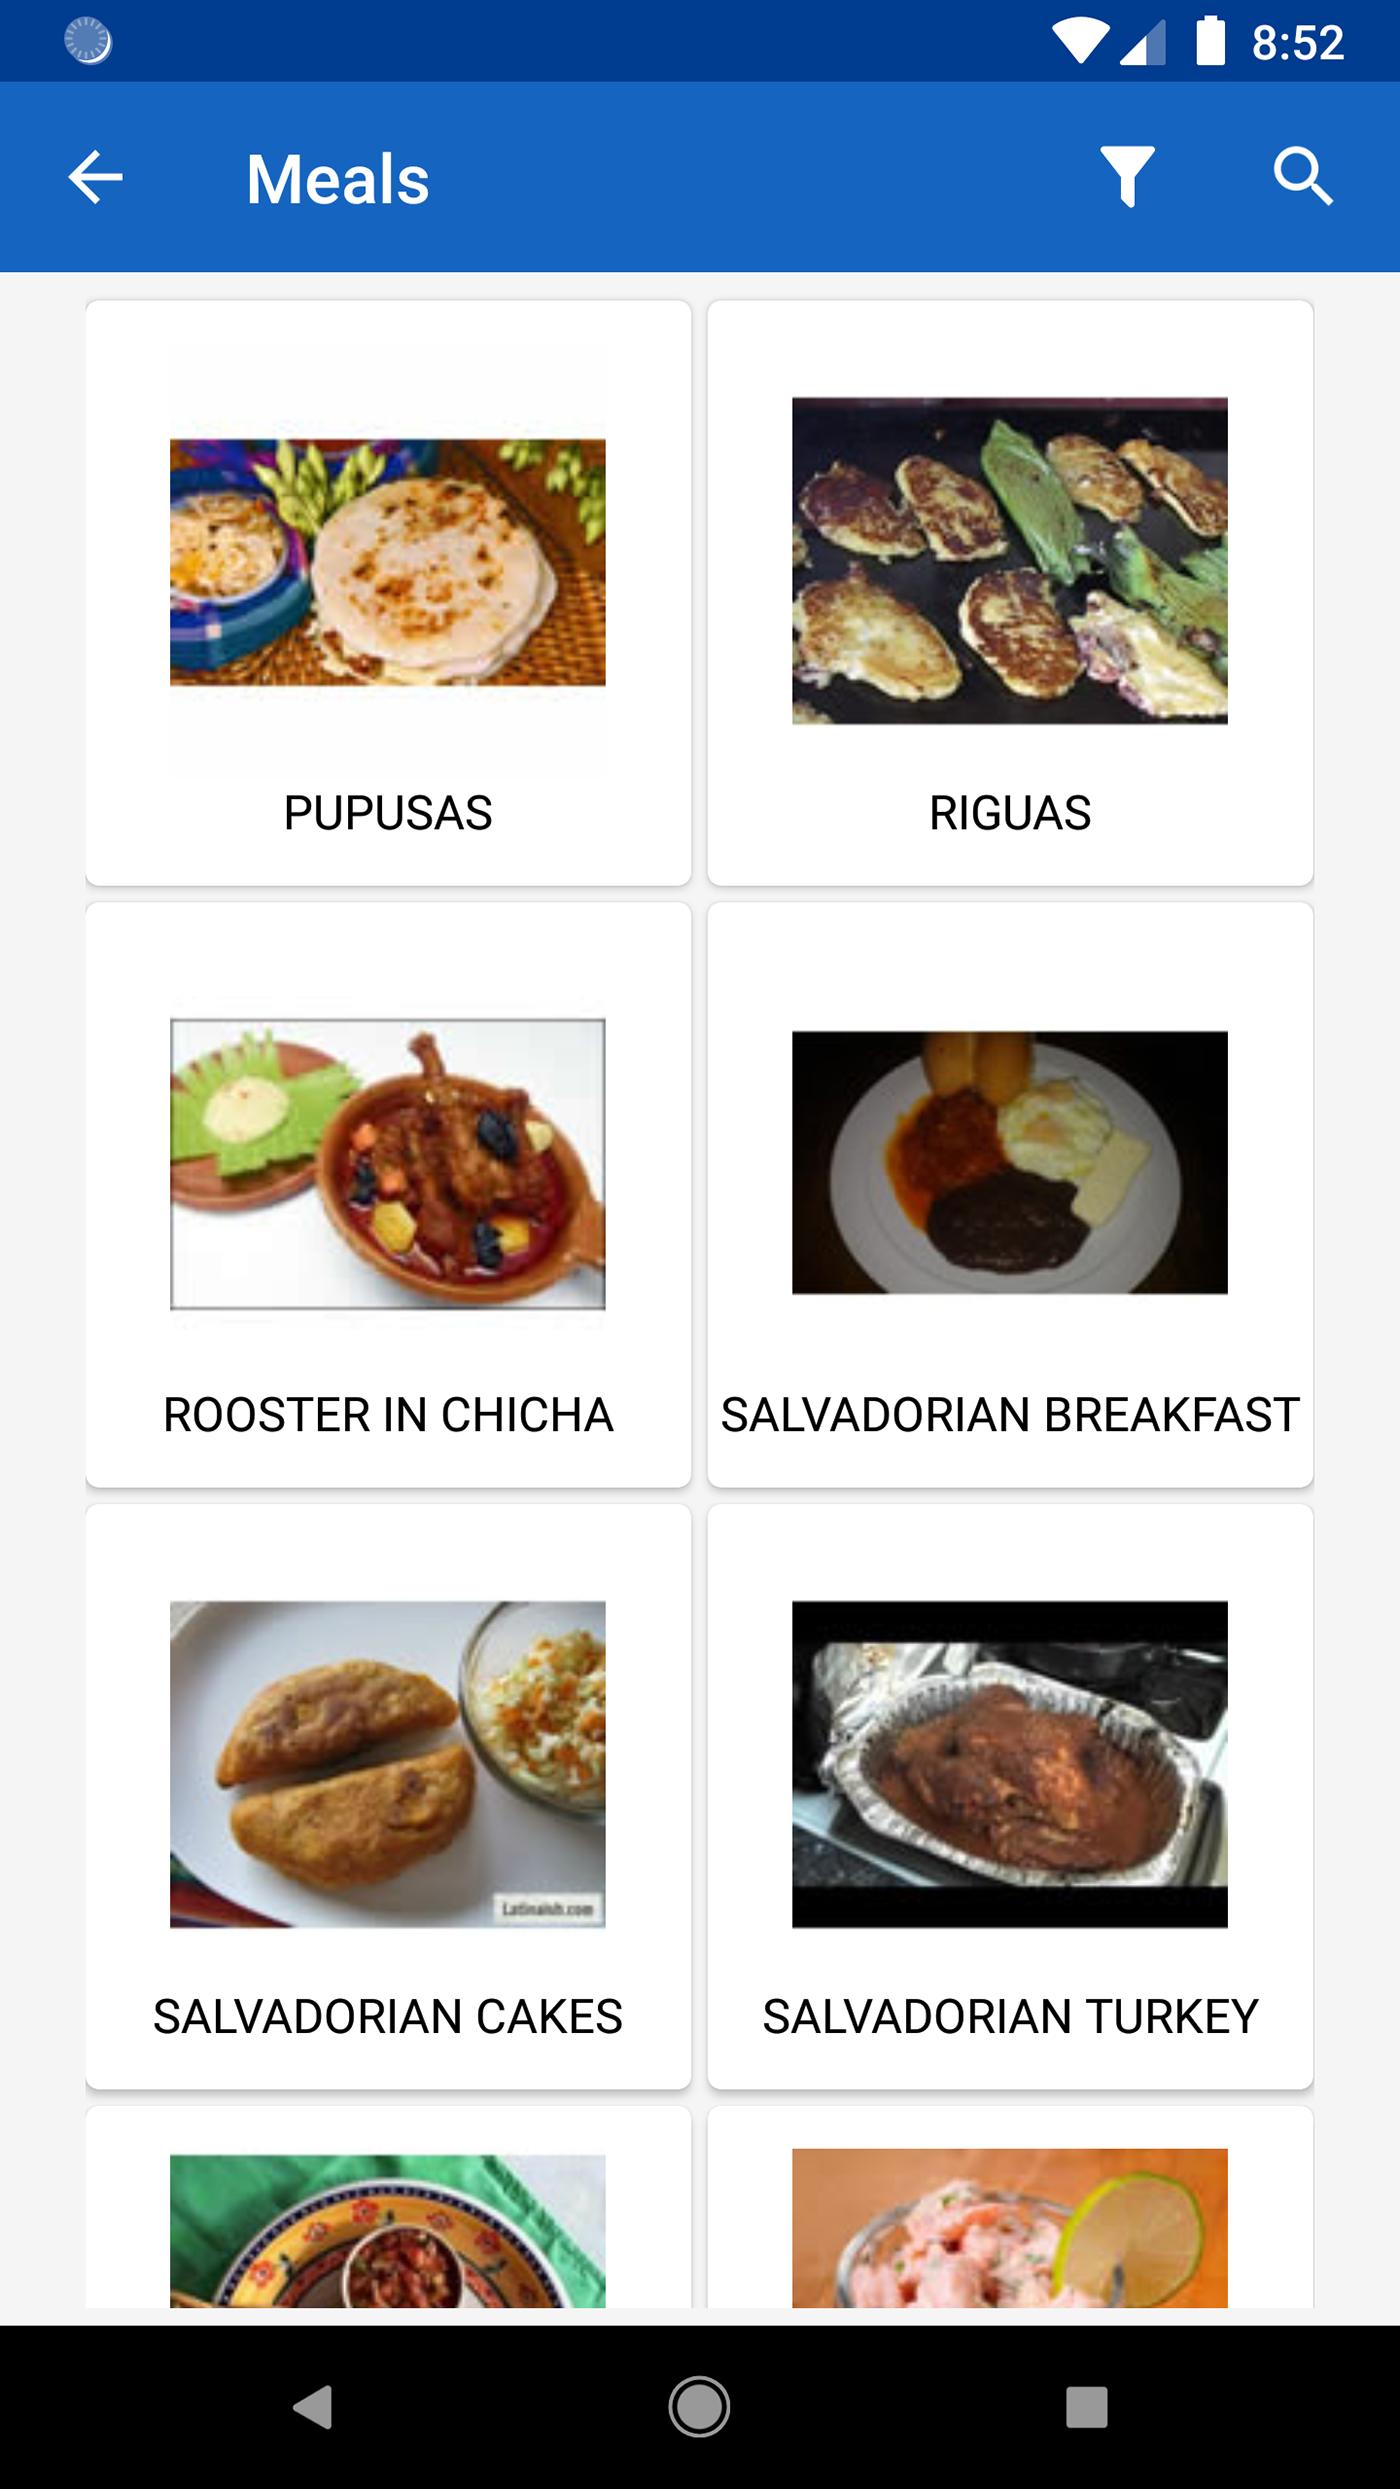 Food  cookbook El Salvador material design android mobile development typical dishes